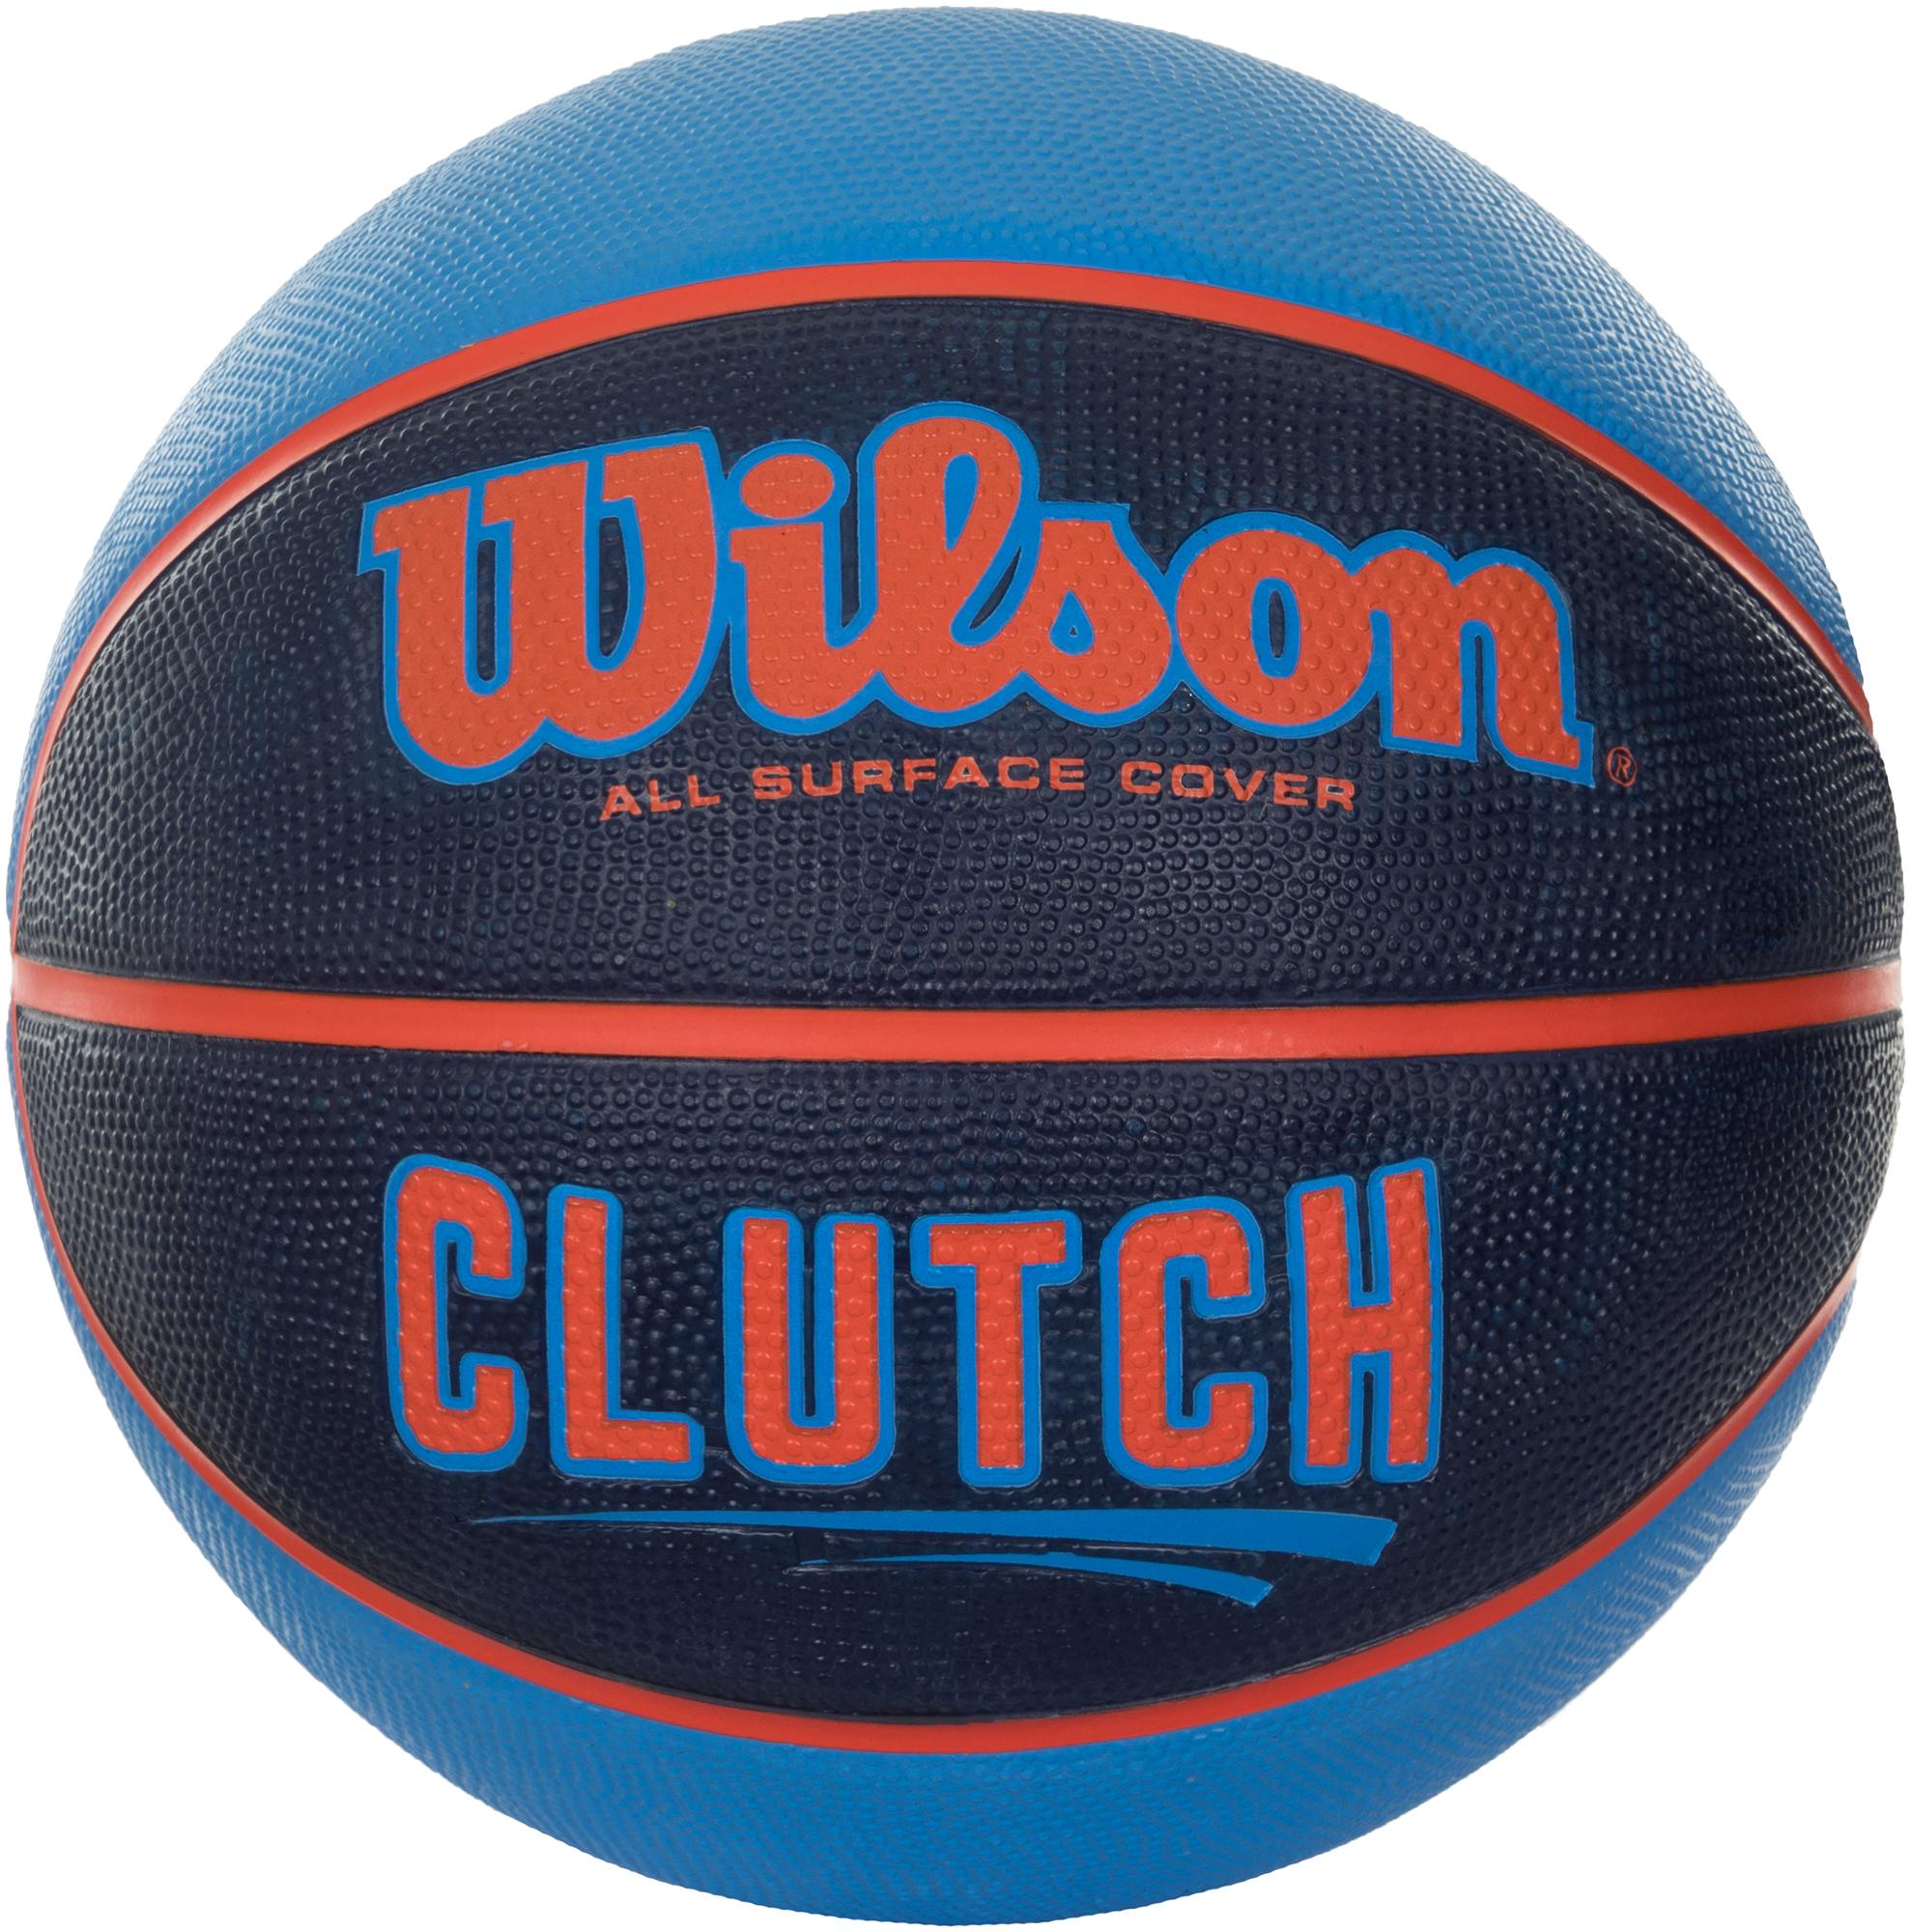 все цены на Wilson Мяч баскетбольный Wilson Clutch онлайн